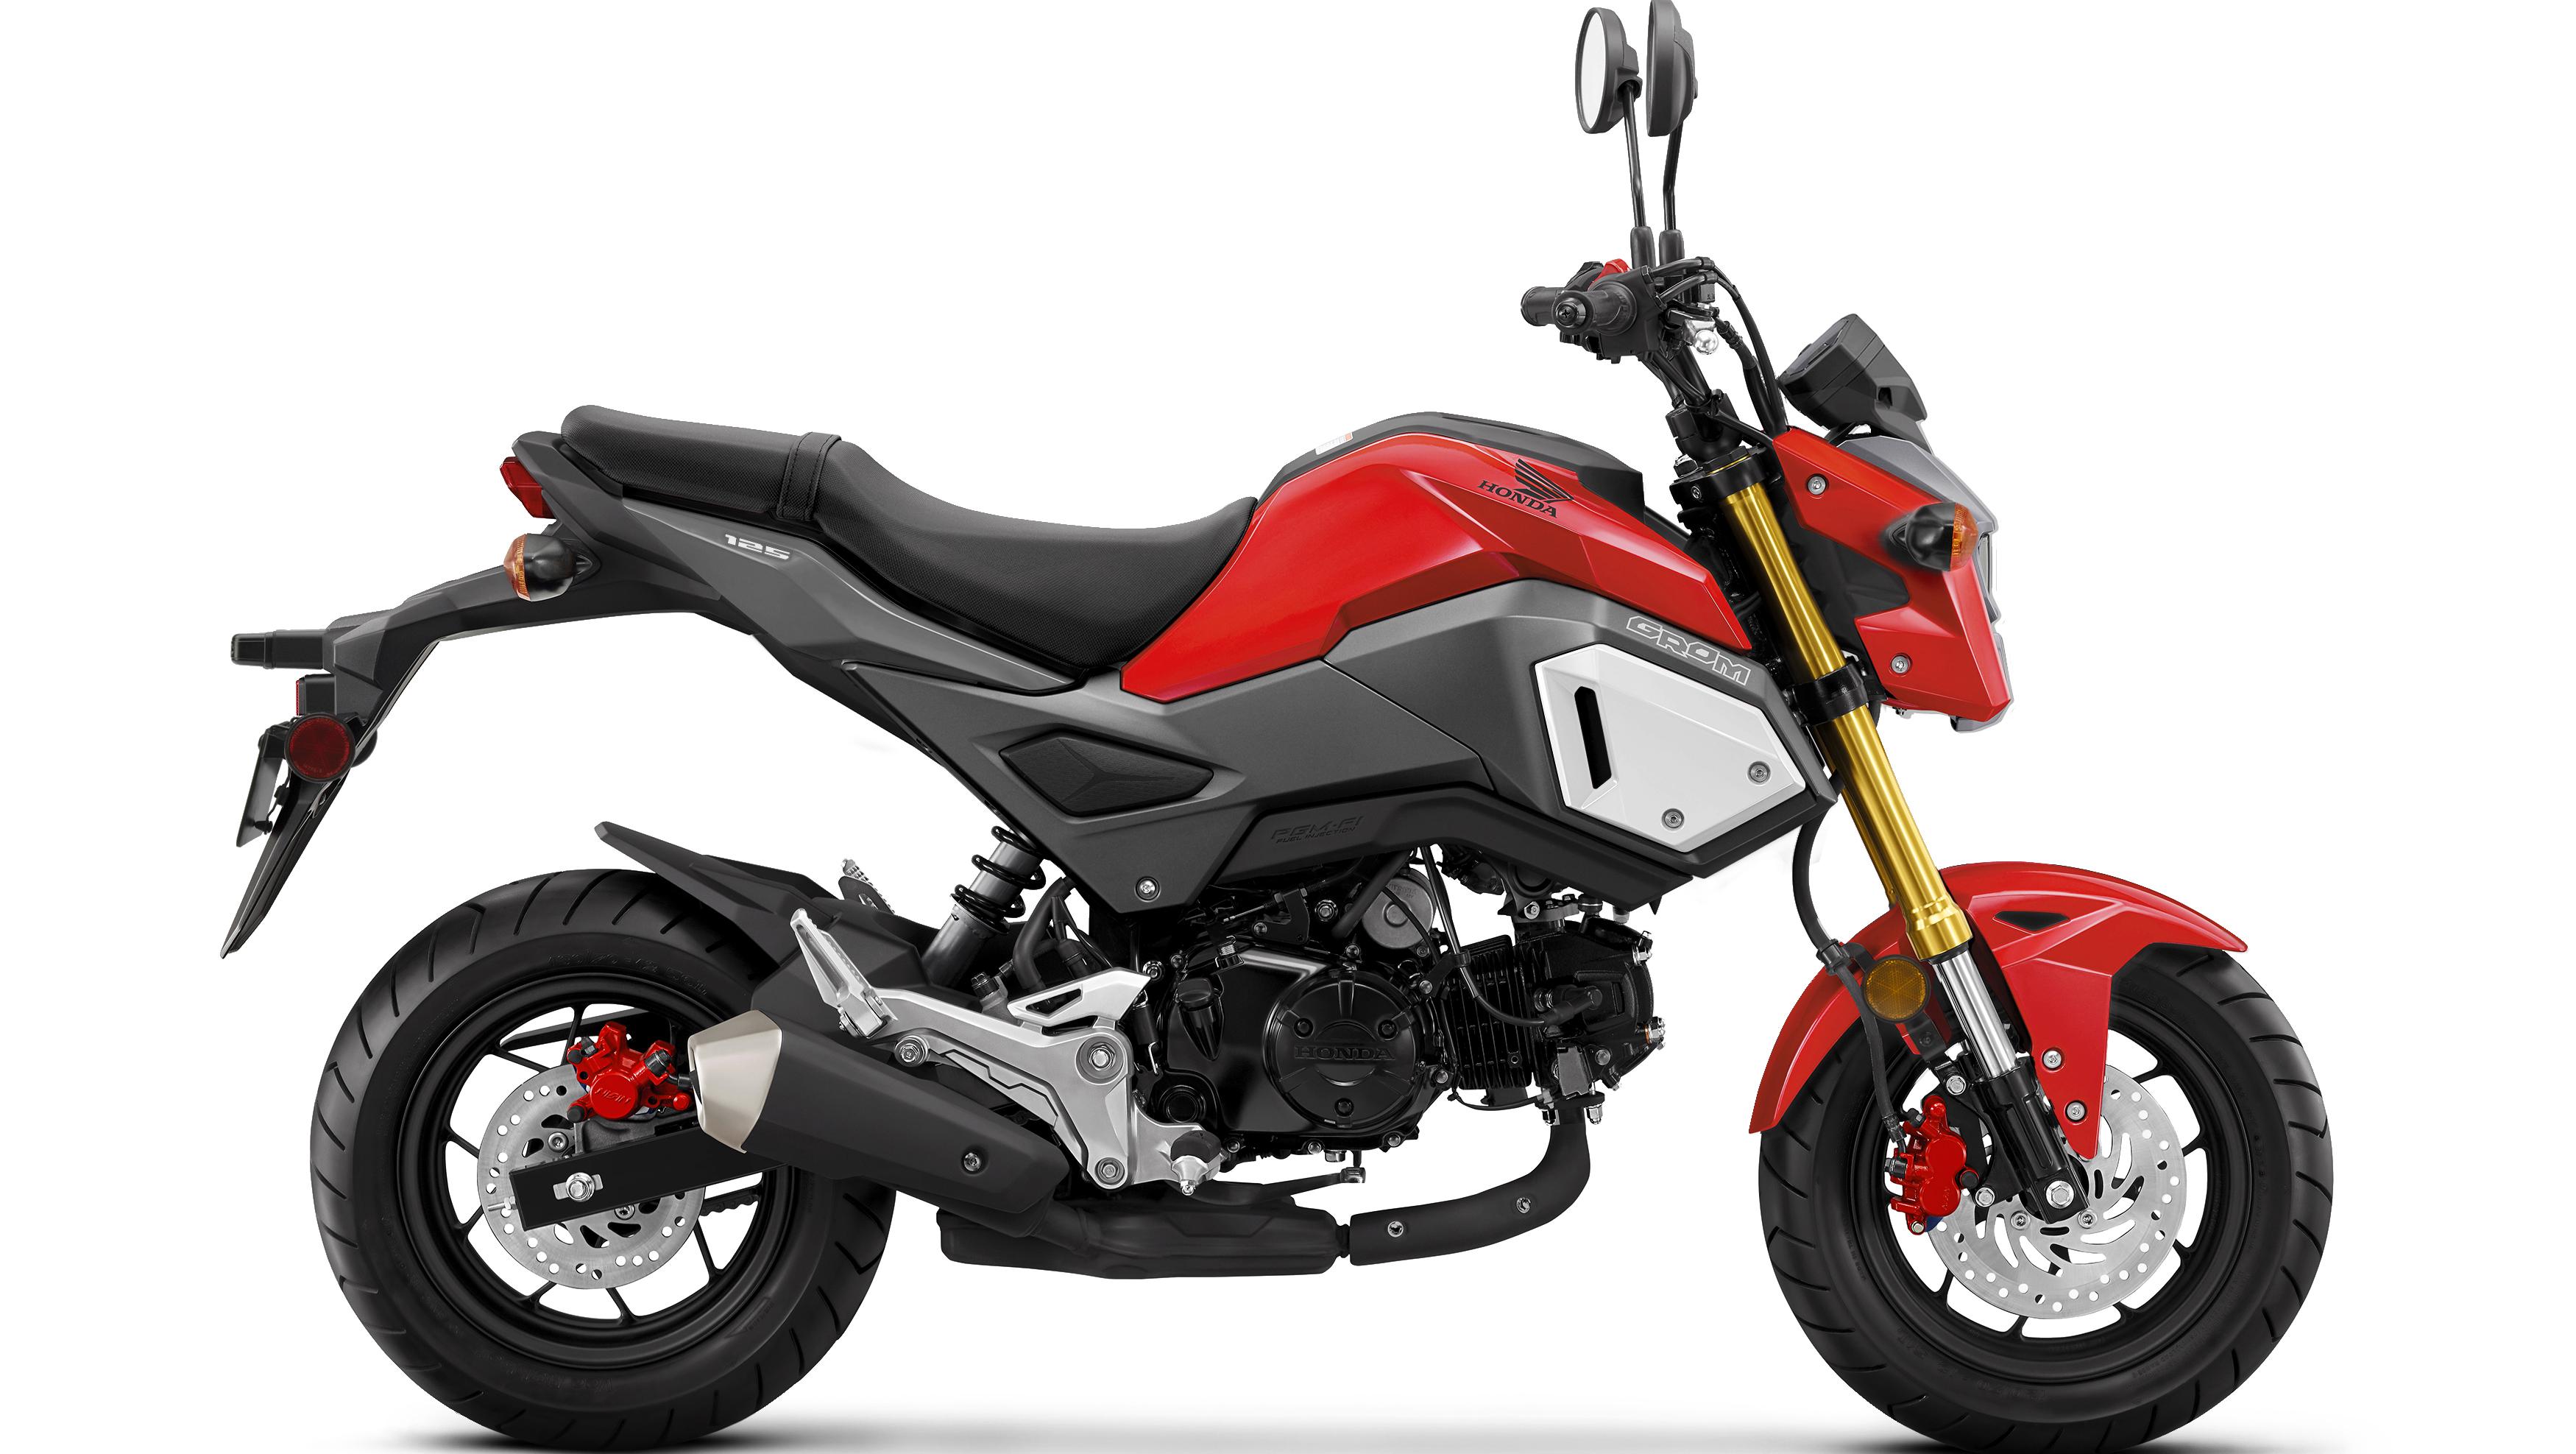 2020 Honda Rebel Top Speed.Honda Reveals Three 2020 On Road Motorcycles Powersports Business